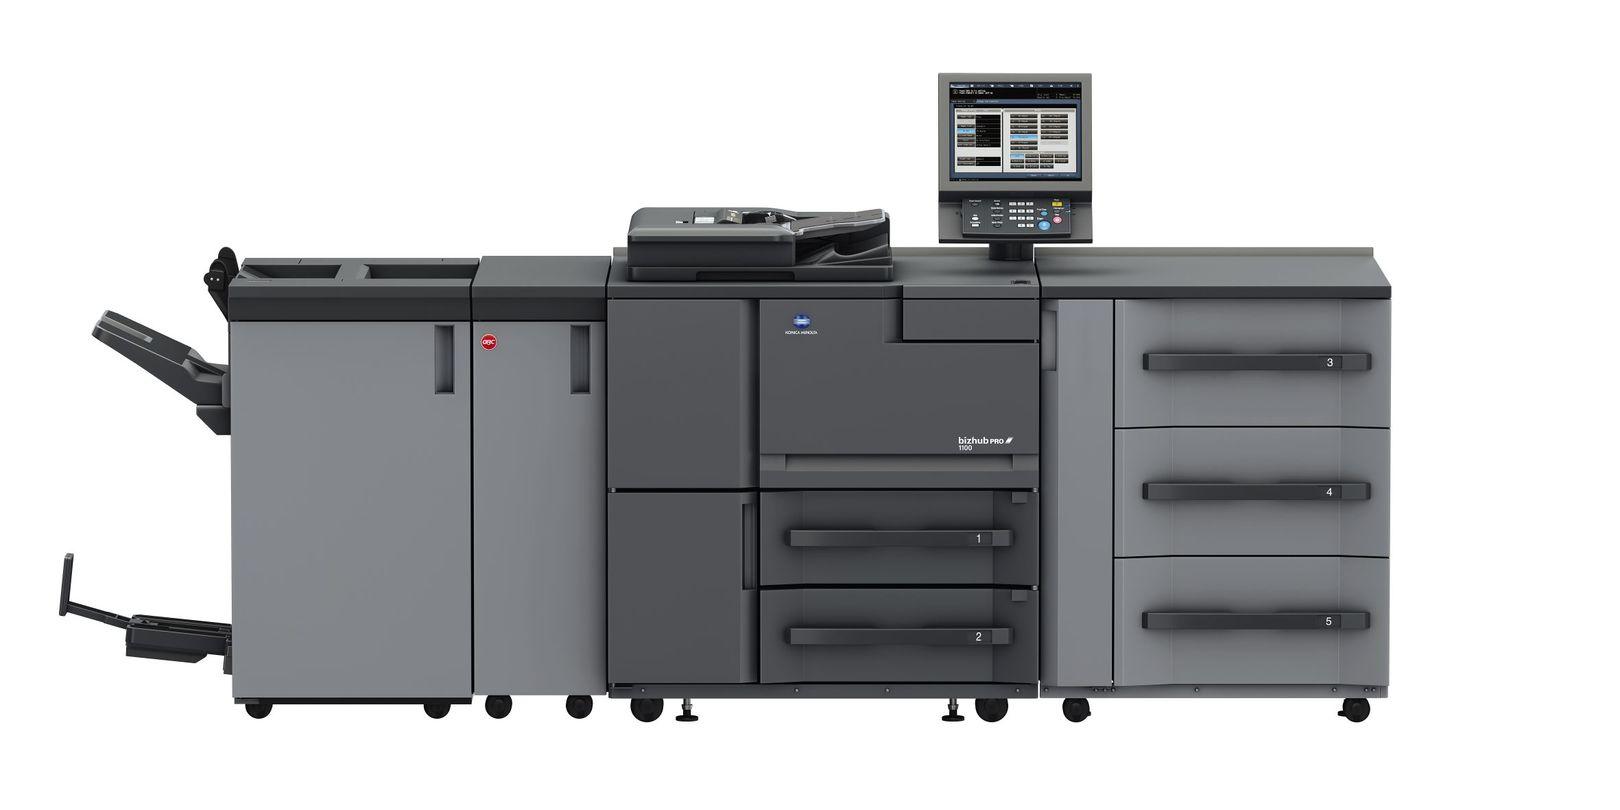 Konica Minolta Bizhub Pro 1100 printer available ot lease or purchase.